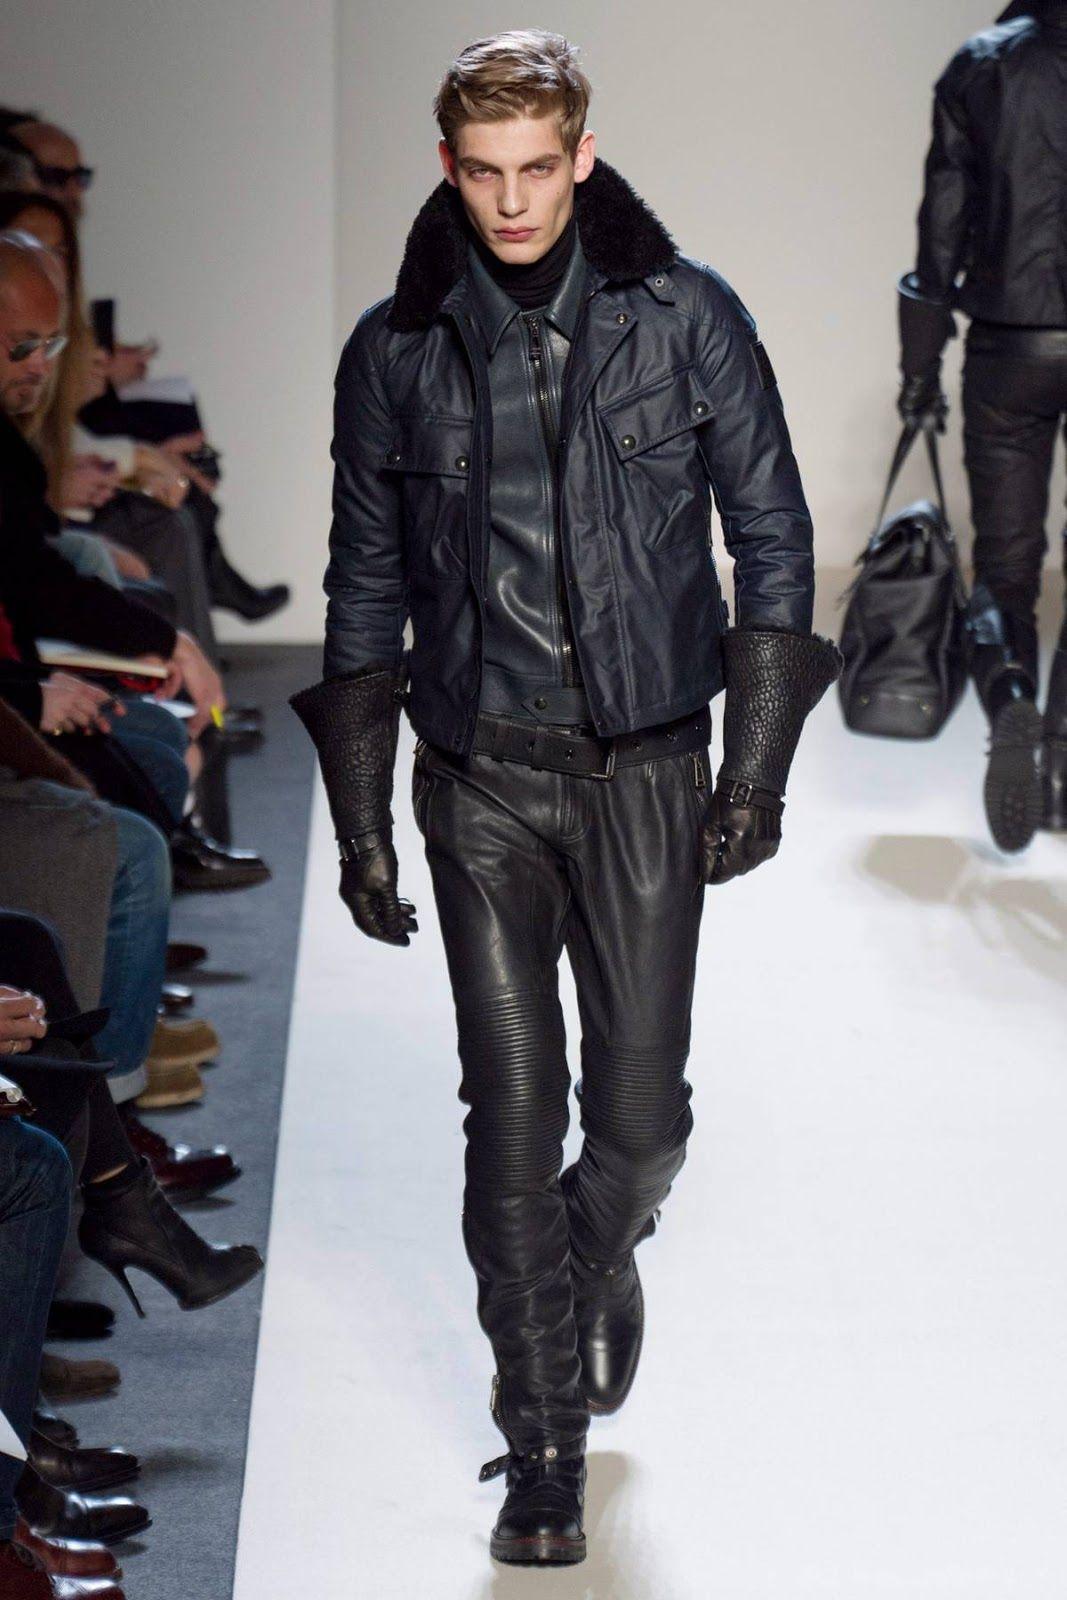 2017 kış modası